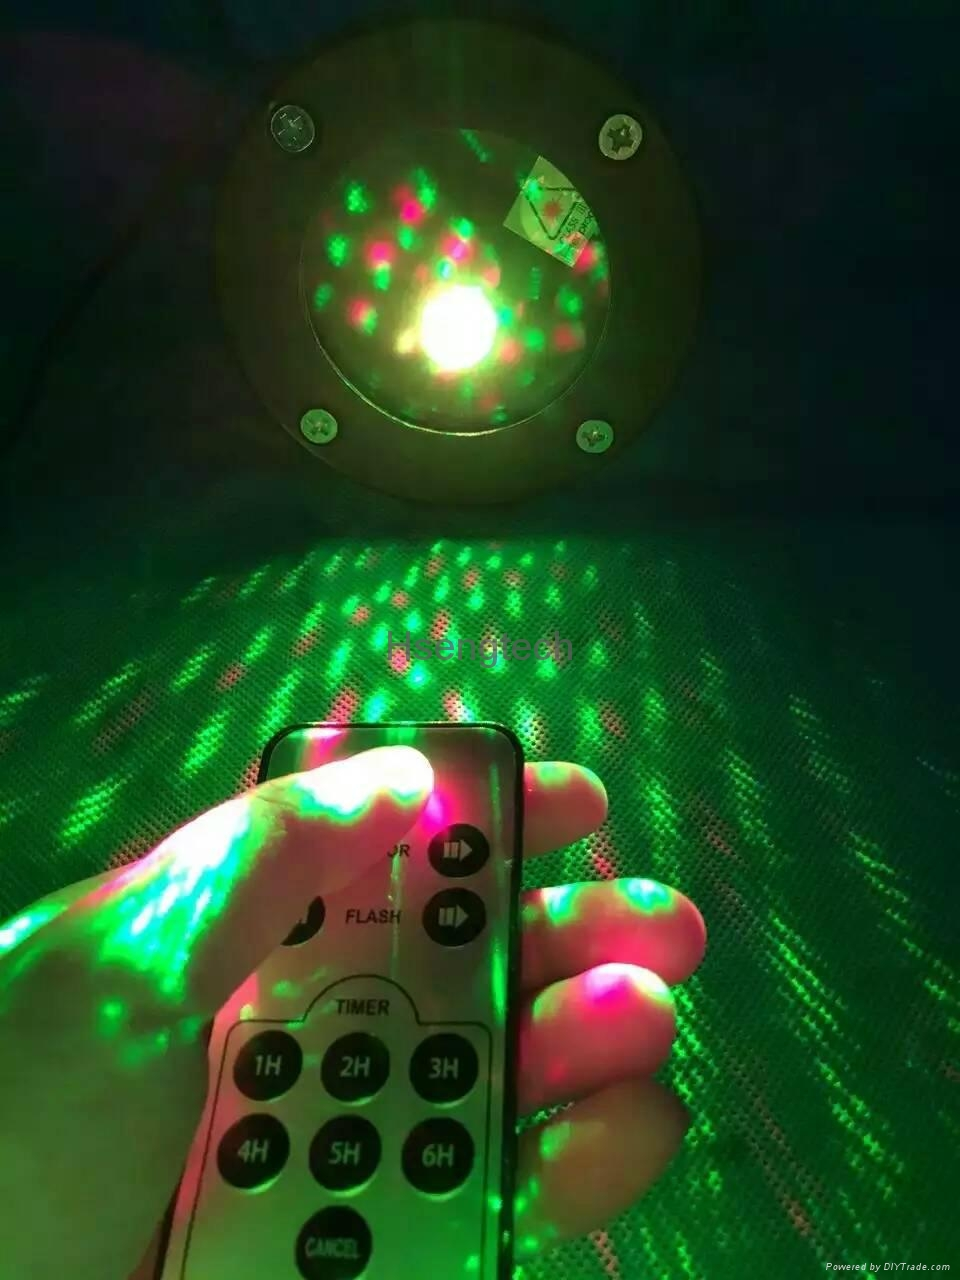 Waterproof Laser Stage Lights Red Green Projector Garden Lawn Lamps Outdoor 3